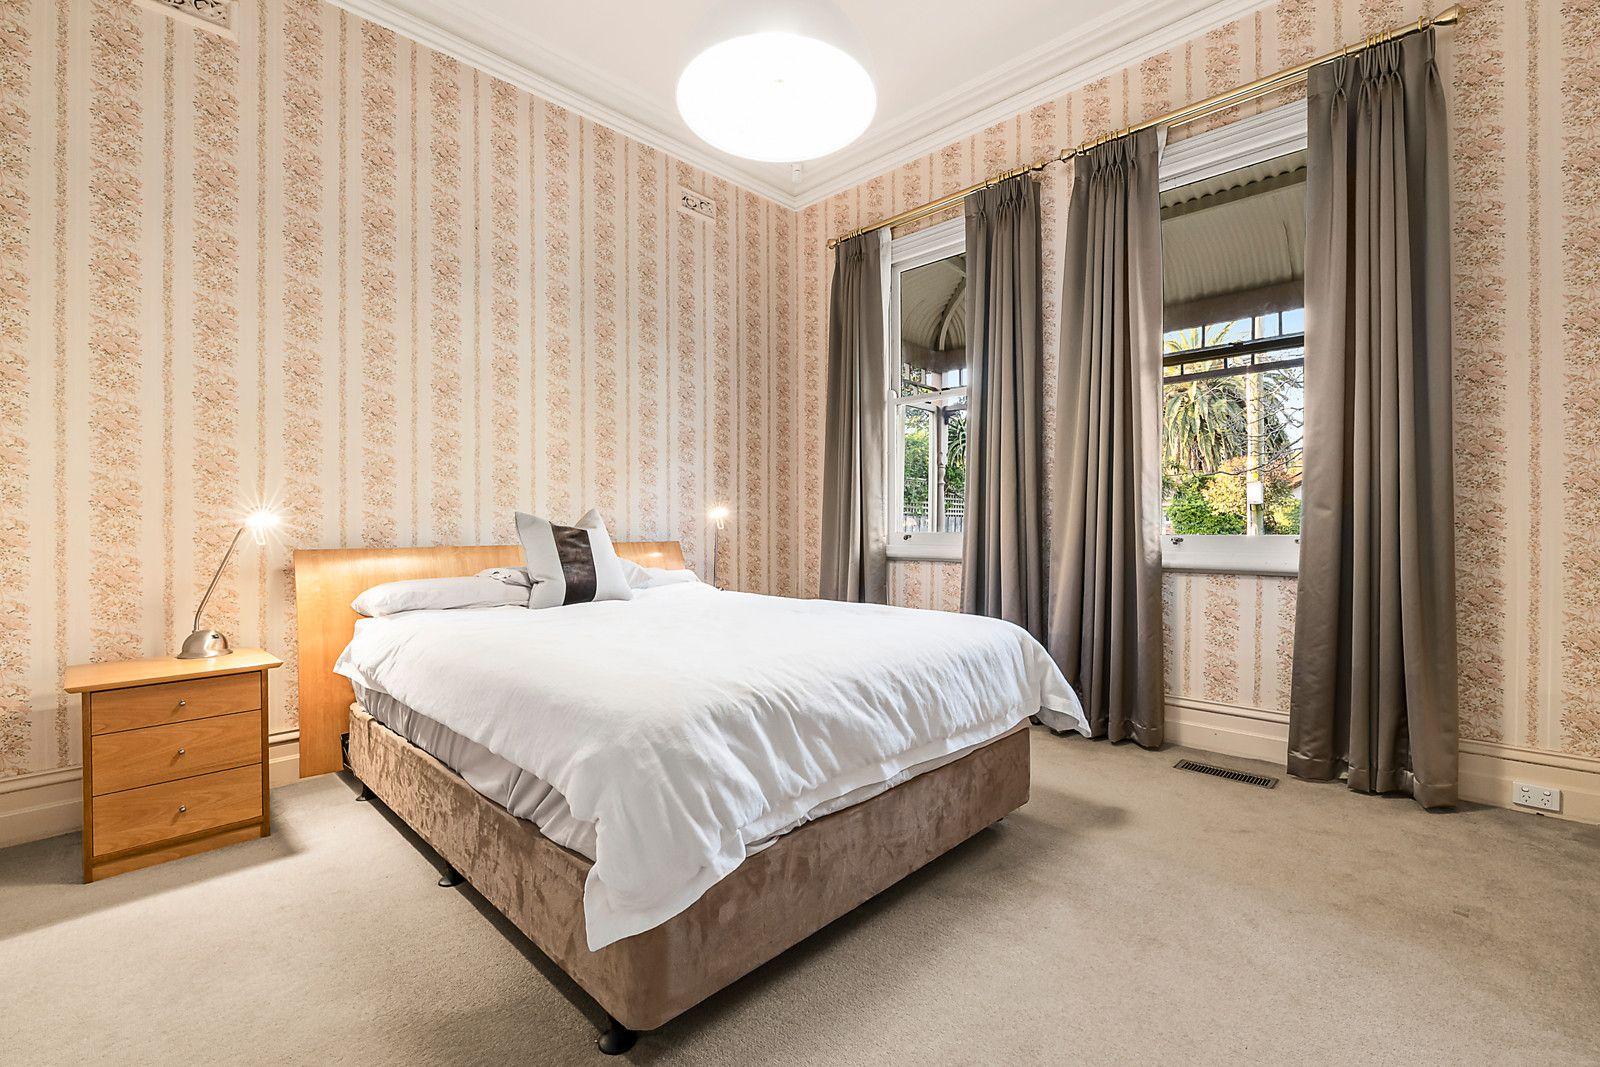 70 Holyrood St Hampton - Bed